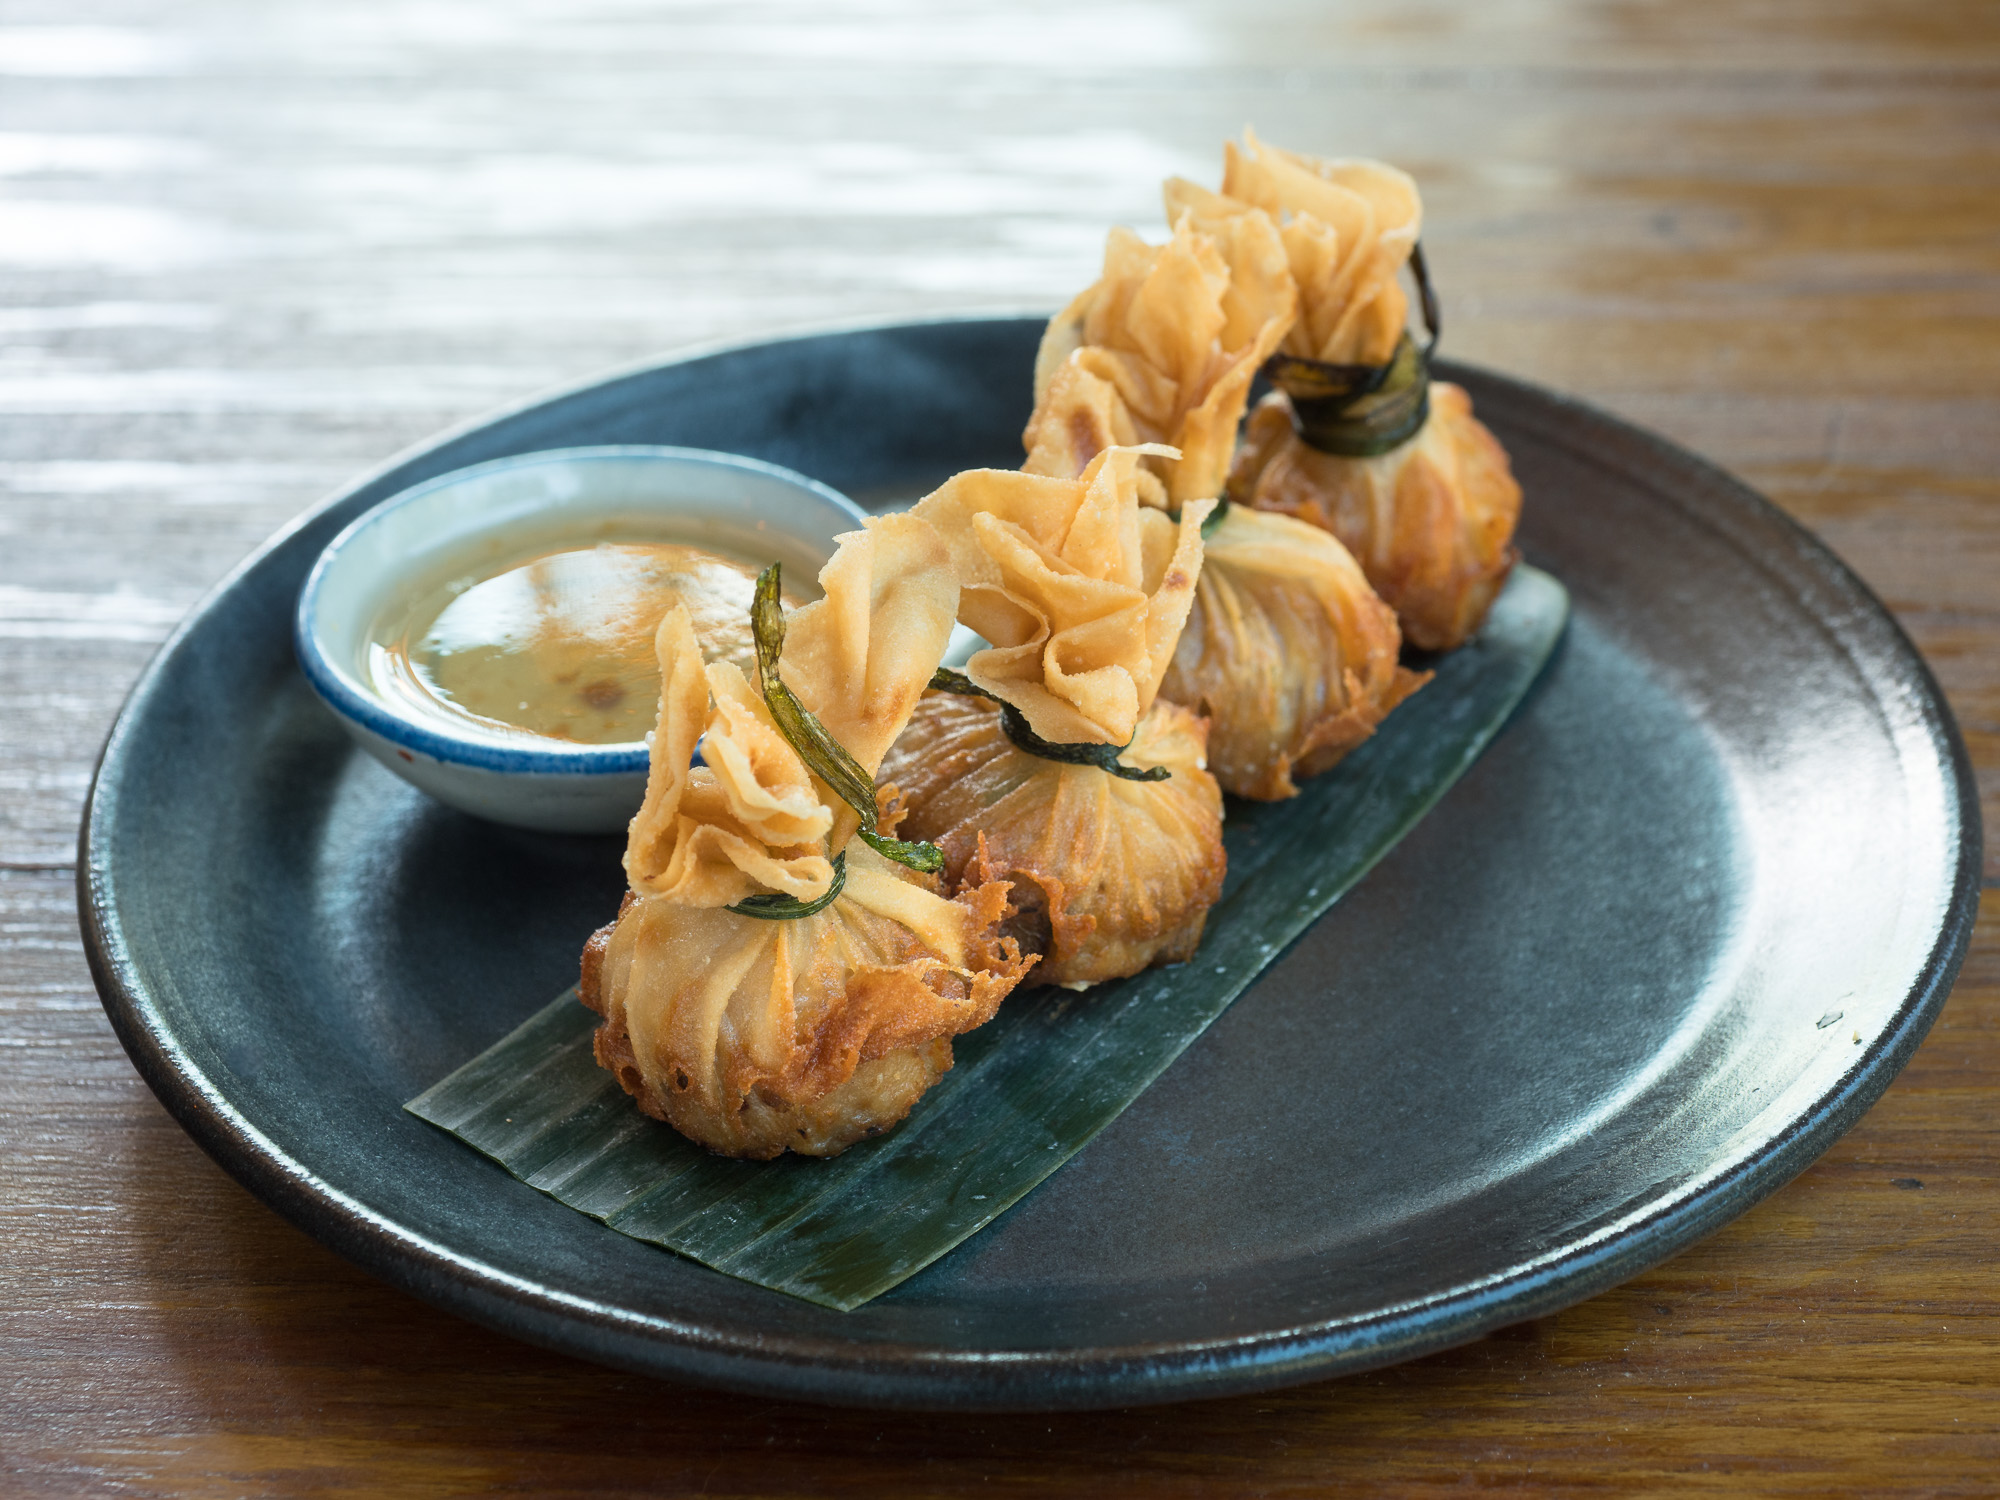 paadee portland pdx food photo photography styling foodie thai jeremy pawlowski eats eatsportland eatsamerica cheap